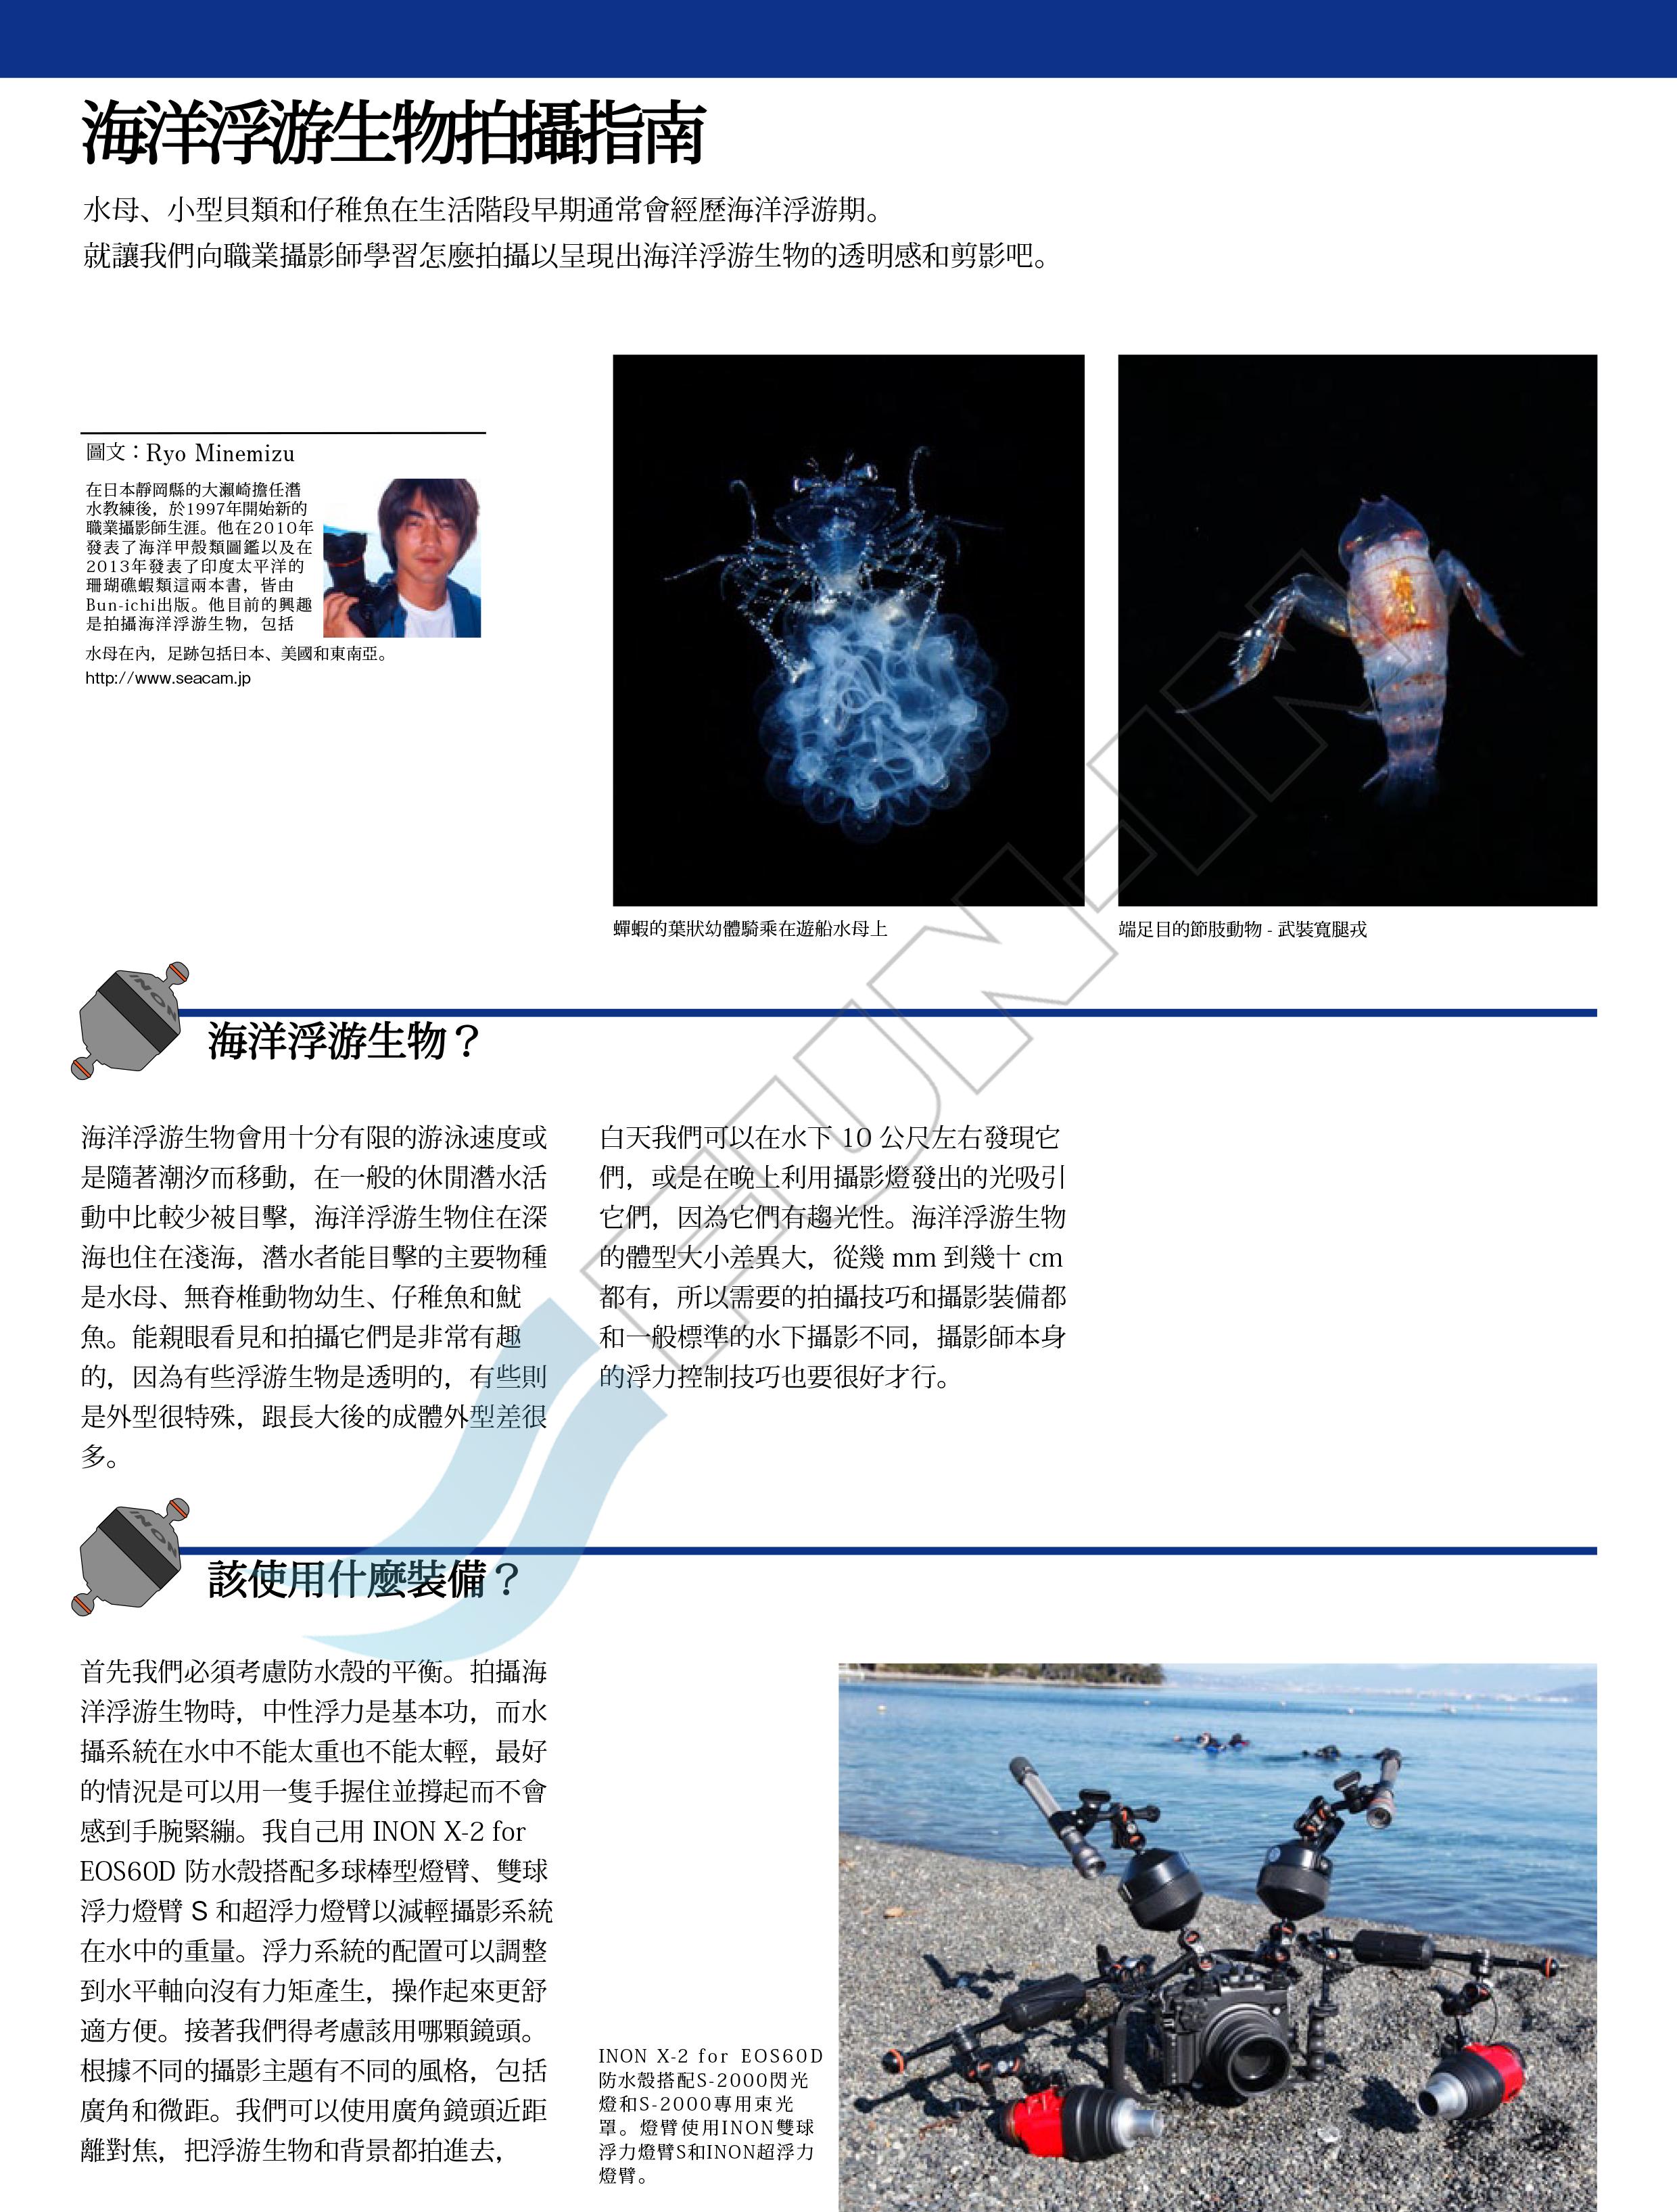 ShootingOceanDrifters-Cht-1